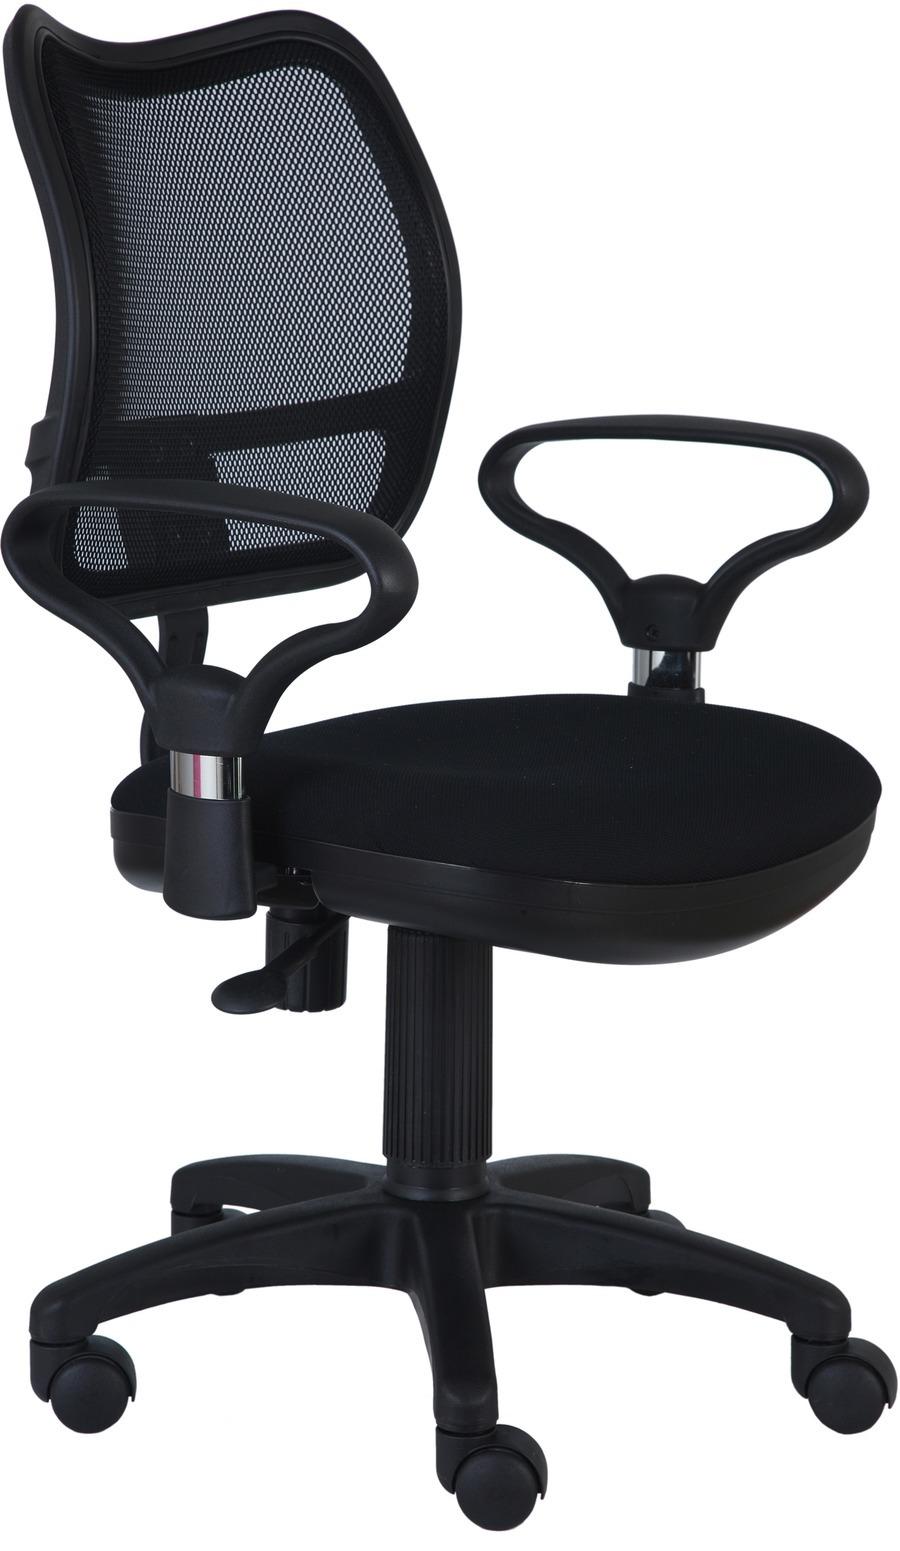 Офисное кресло CH 799 AXSNКабинет<br><br><br>Длина мм: 0<br>Высота мм: 560<br>Глубина мм: 470